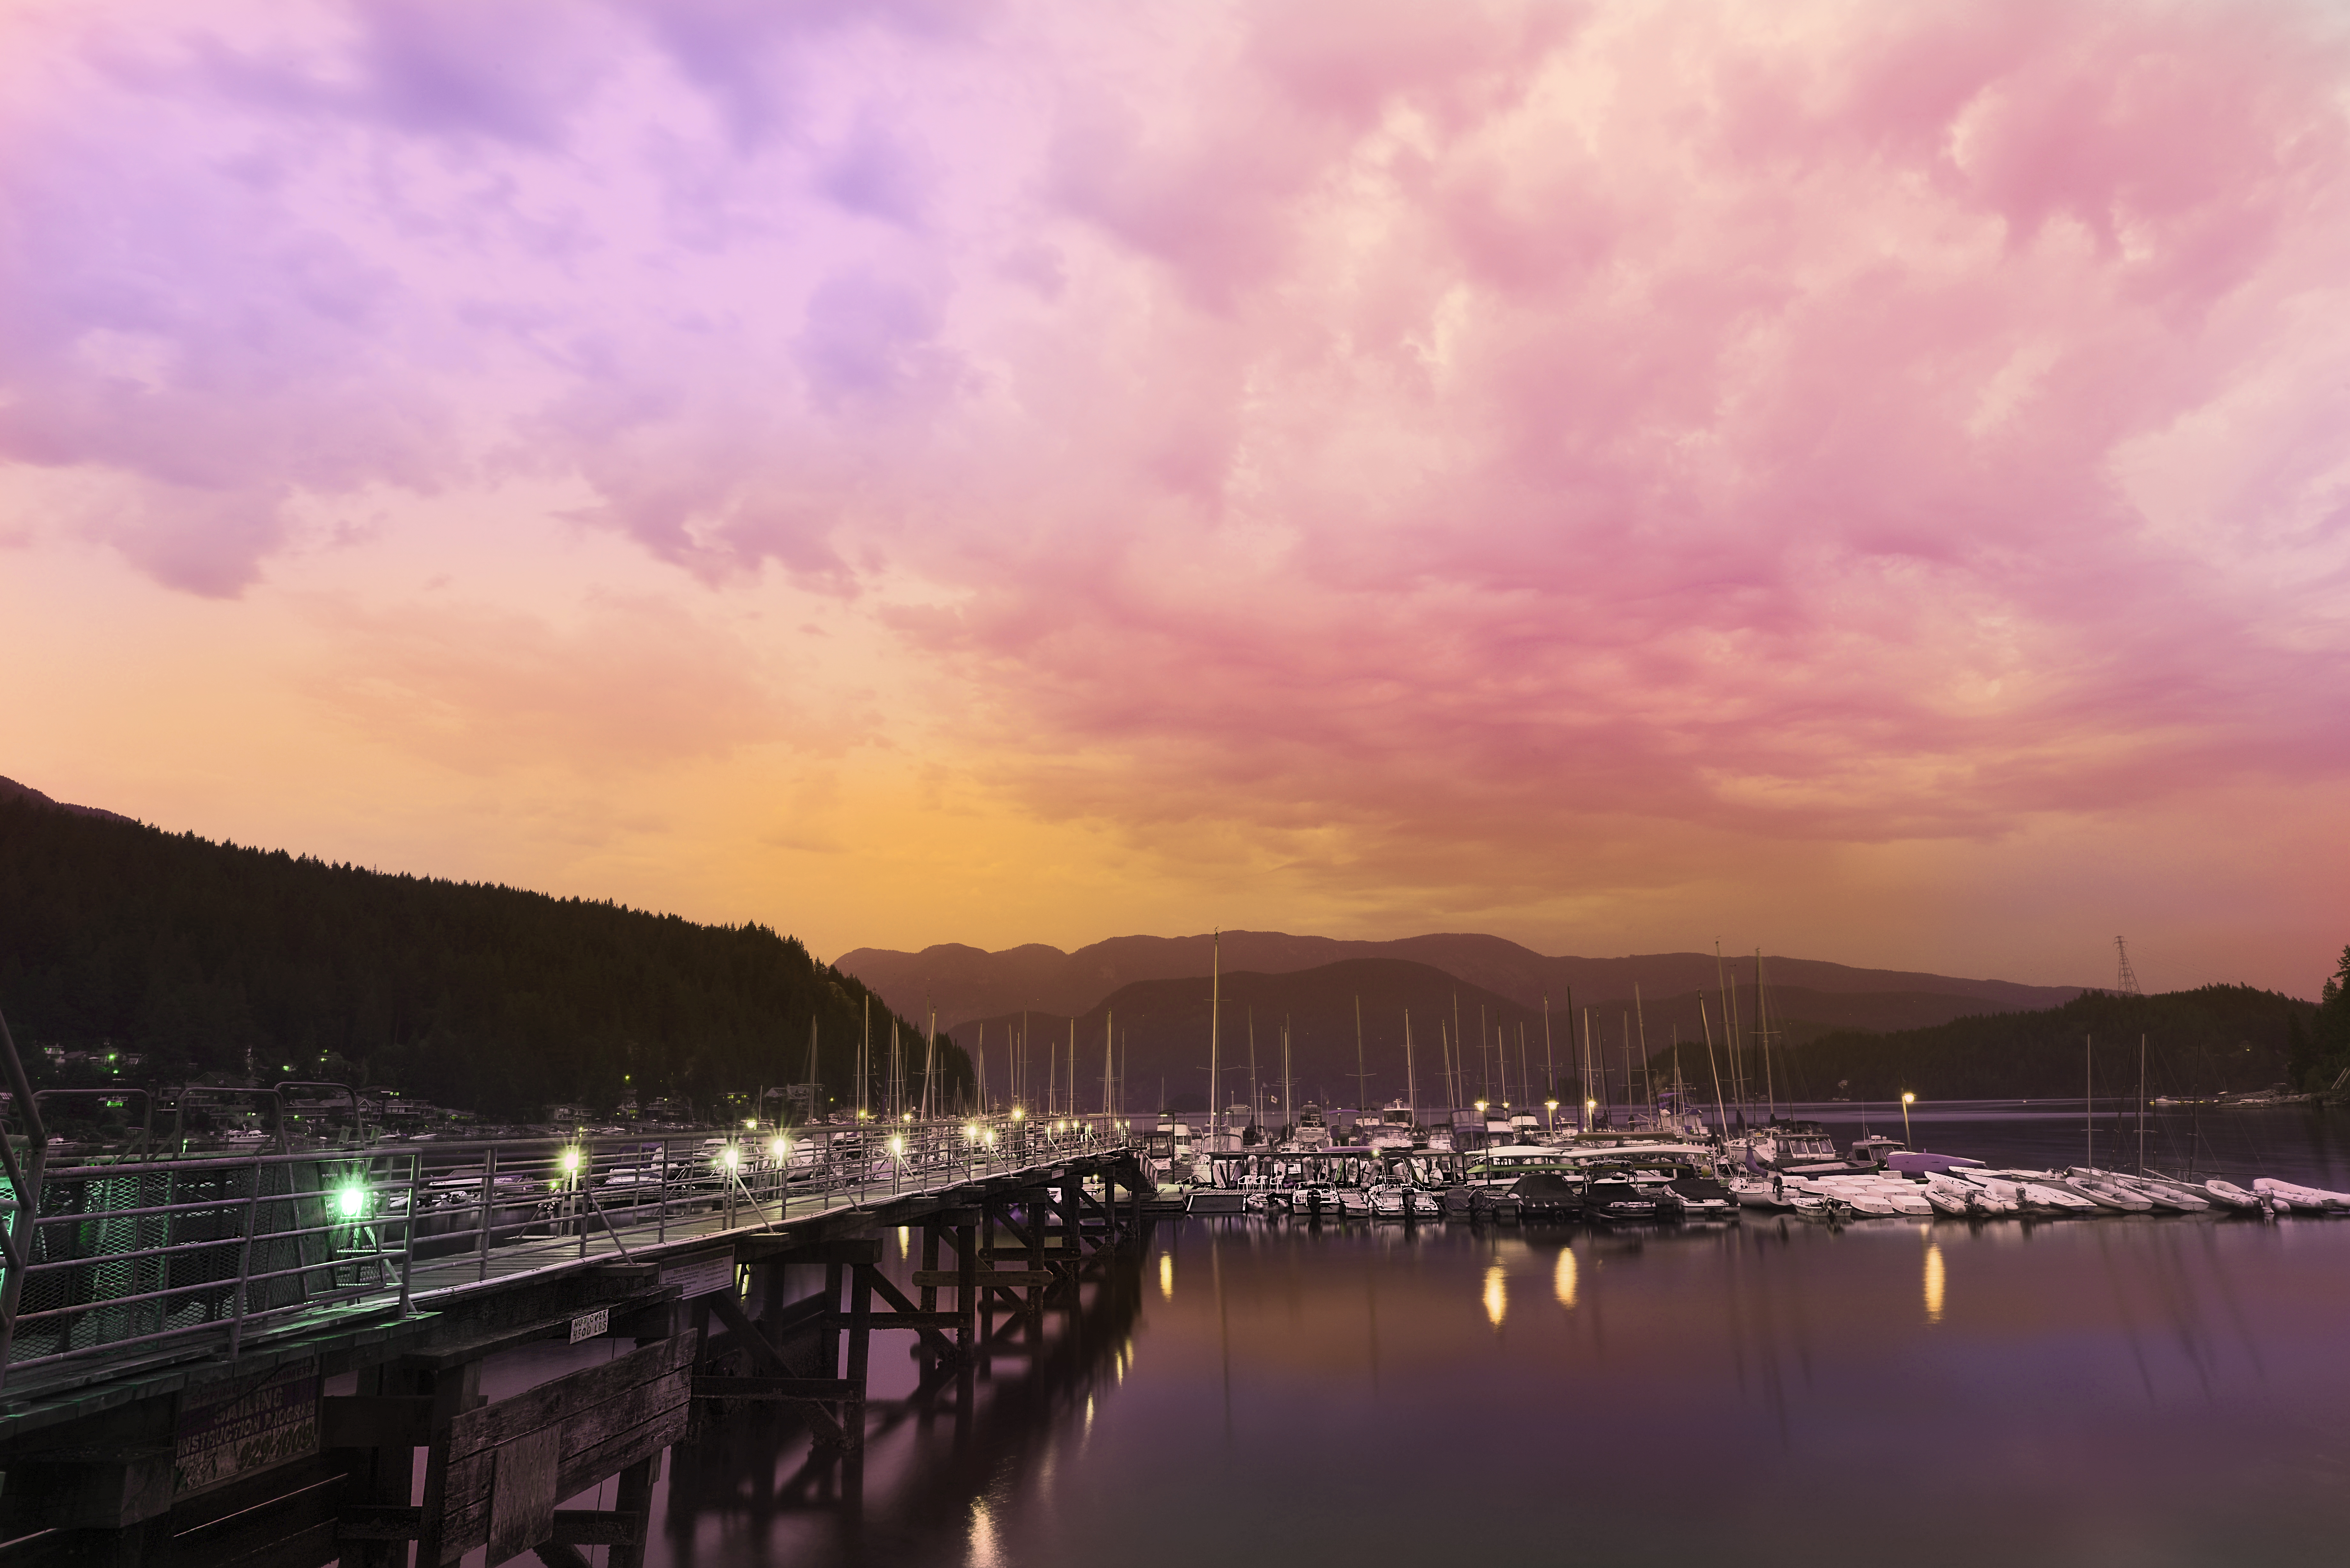 Travel Light Sunset Sky Seascape Color Colour Beautiful Weather Night Clouds Landscape Boats Pier Dock Nikon Deep Cove